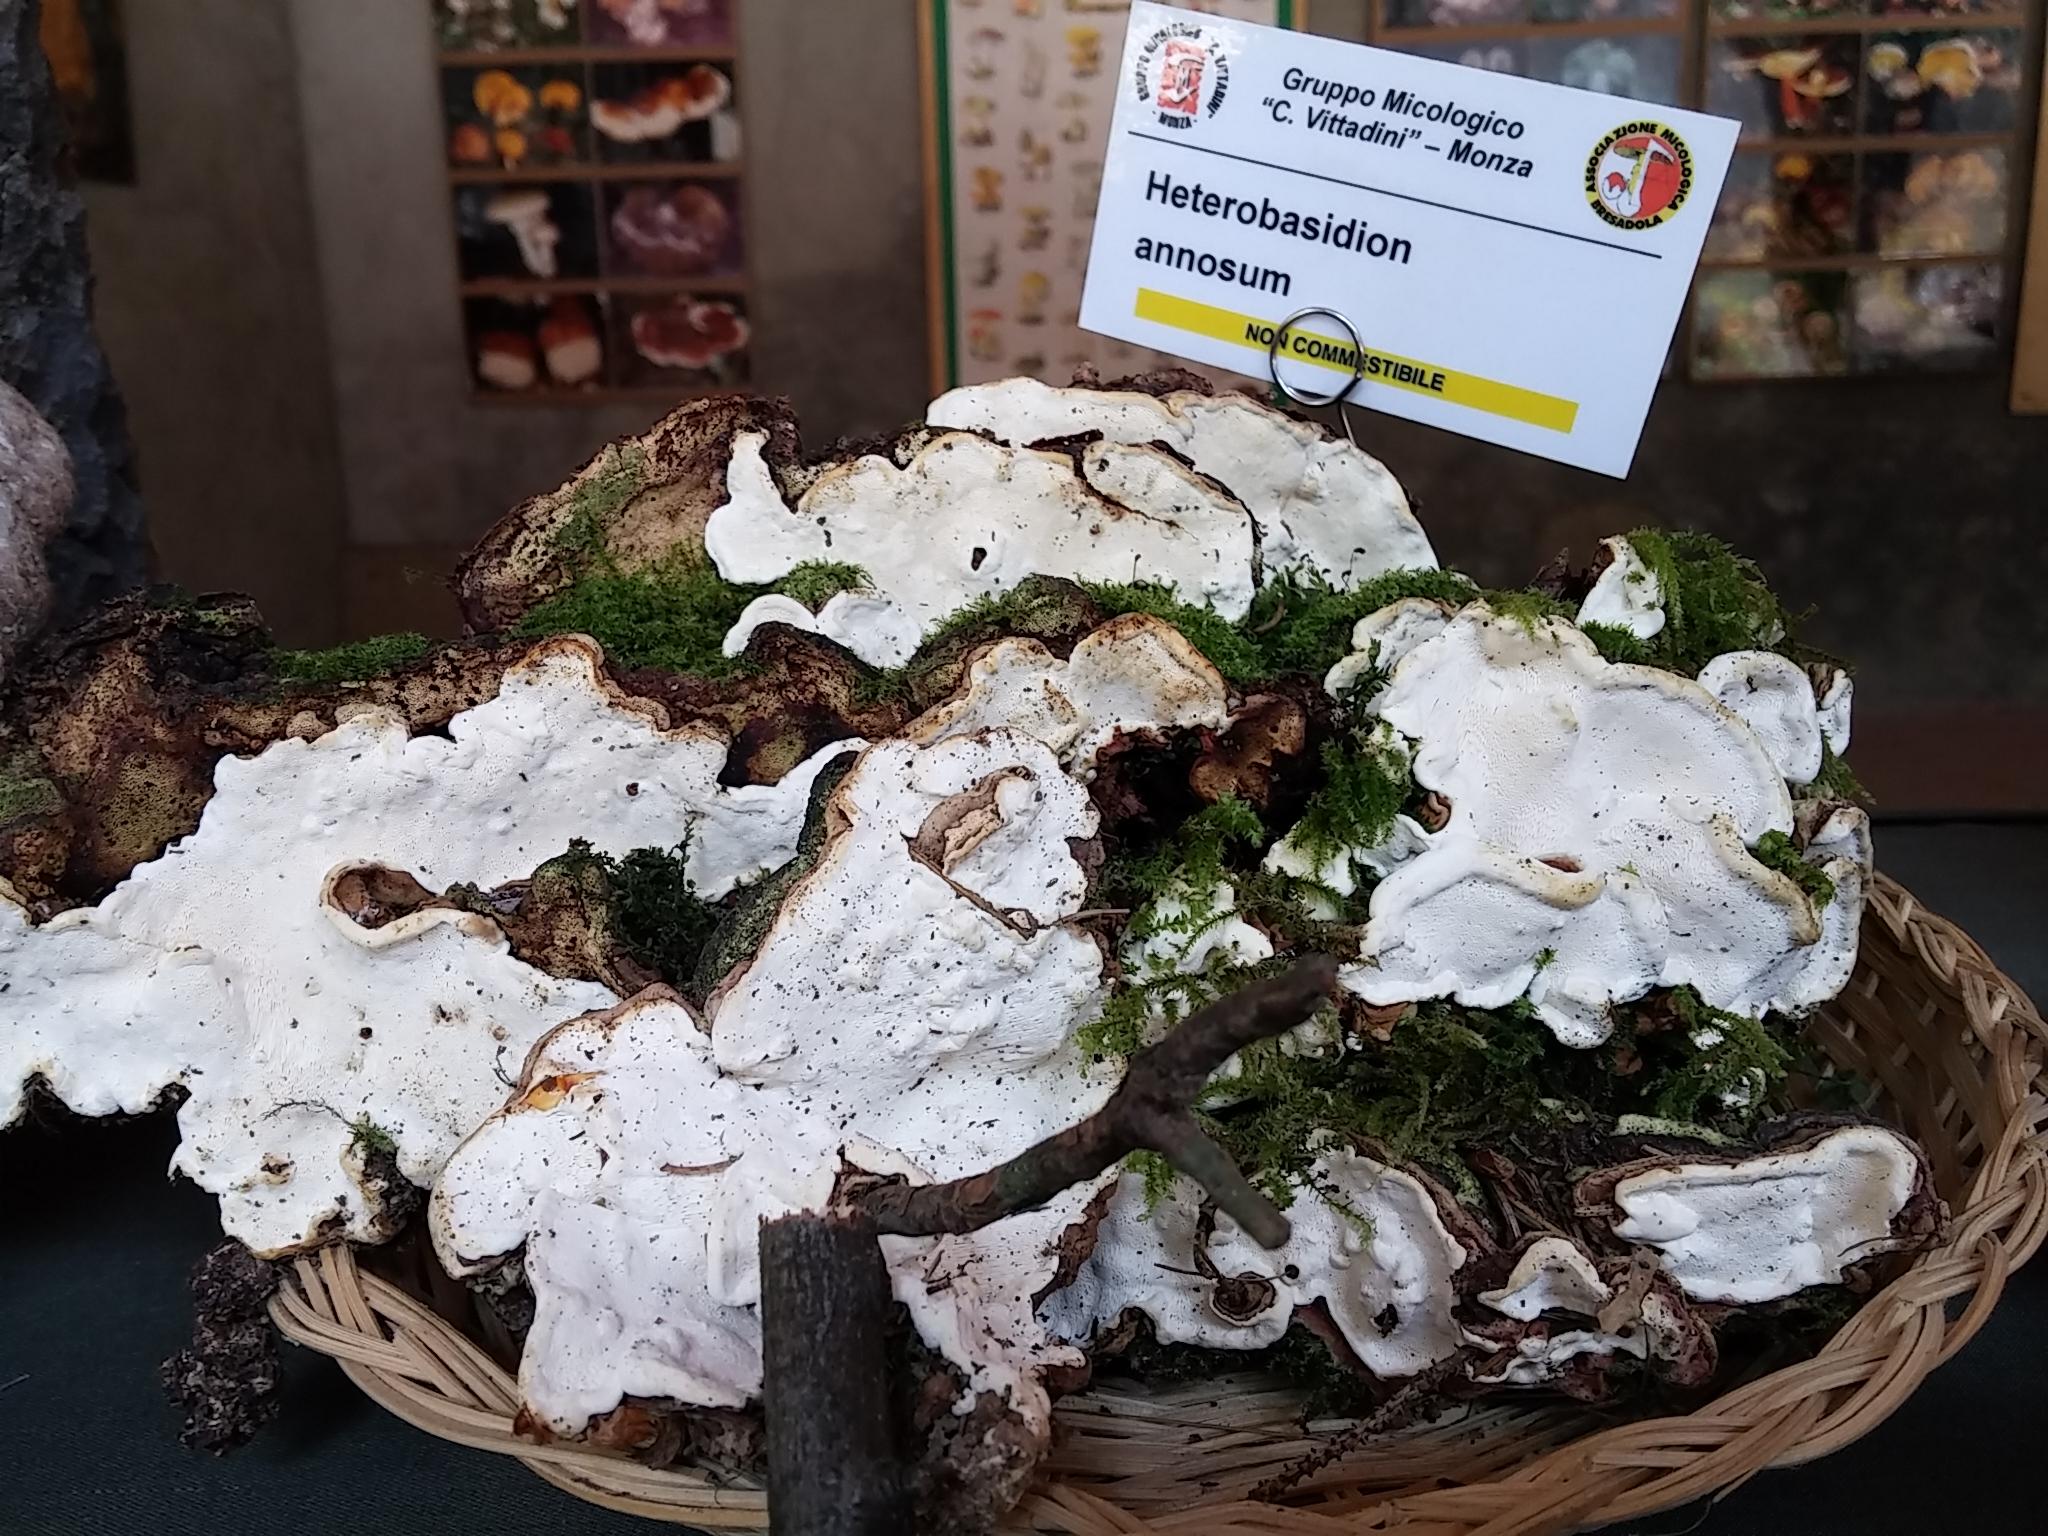 Ricco Heterobasidion annosum  (Foto Mauri)